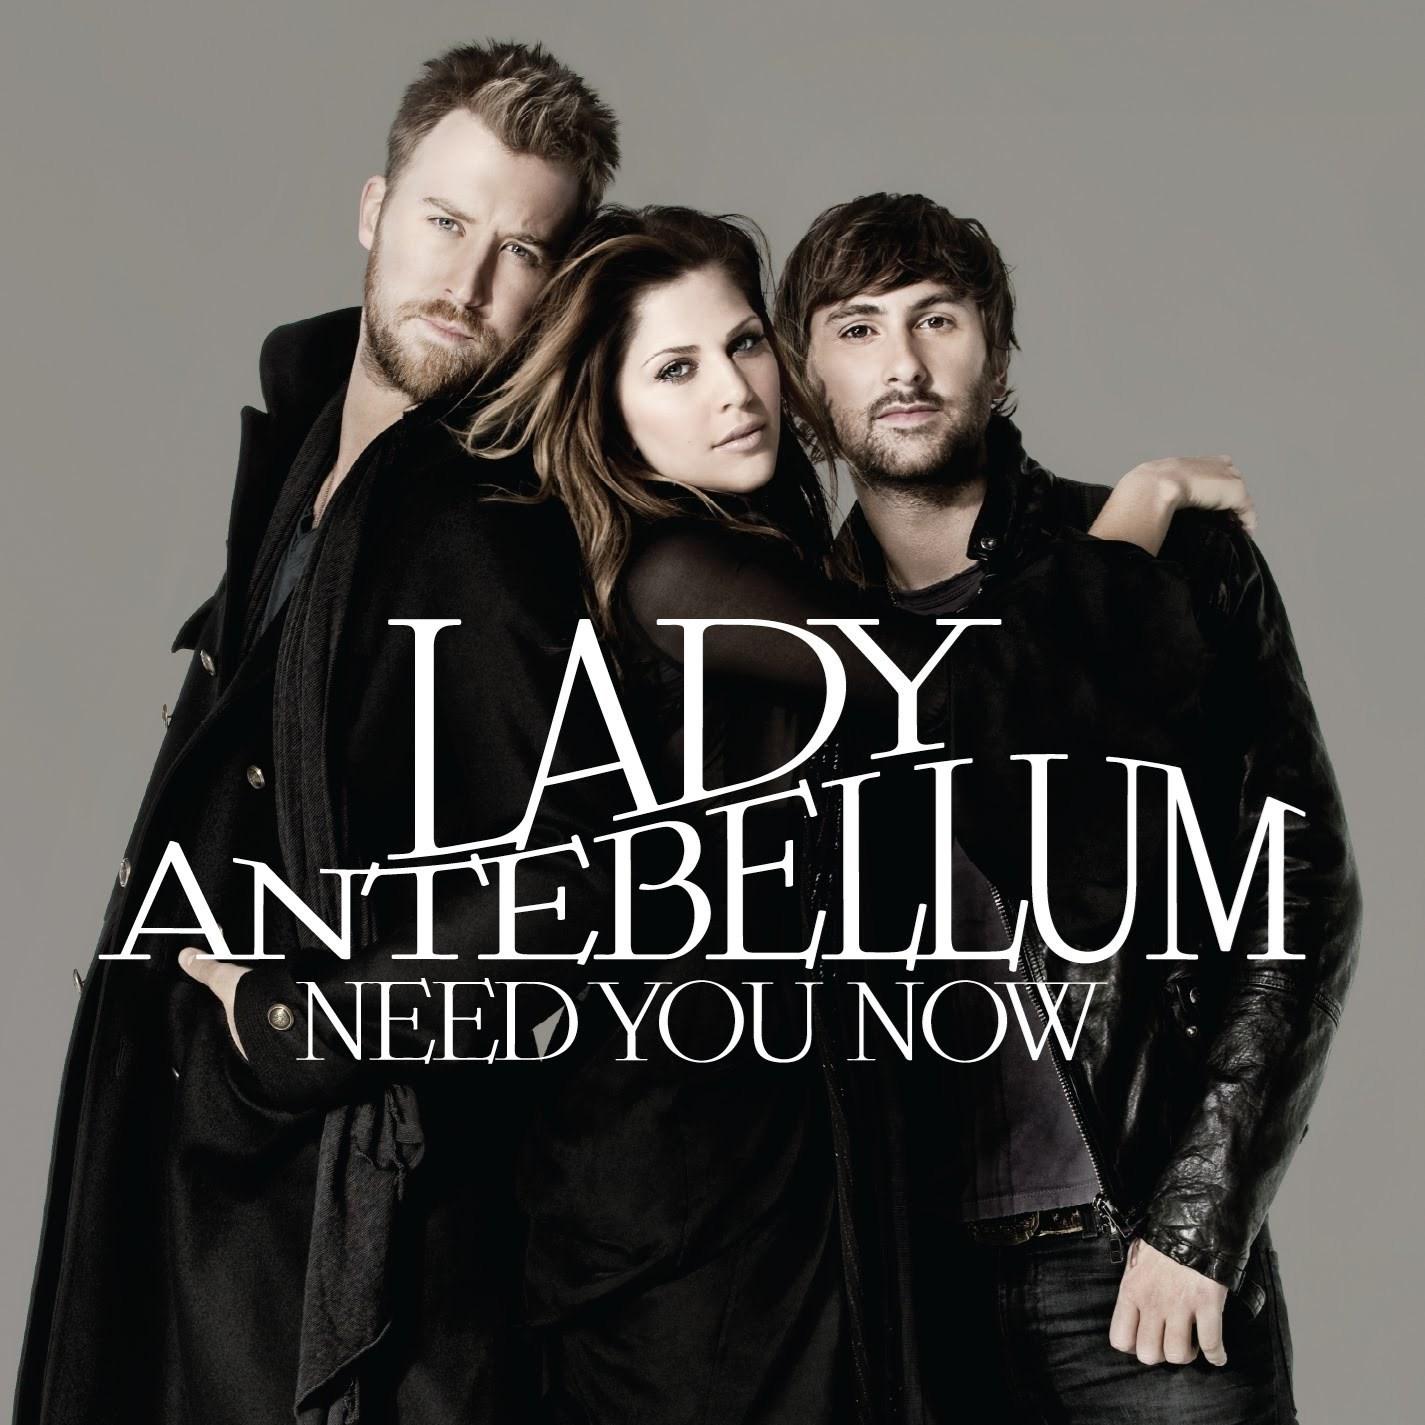 lady-antebellum-need-you-now.21943.jpg